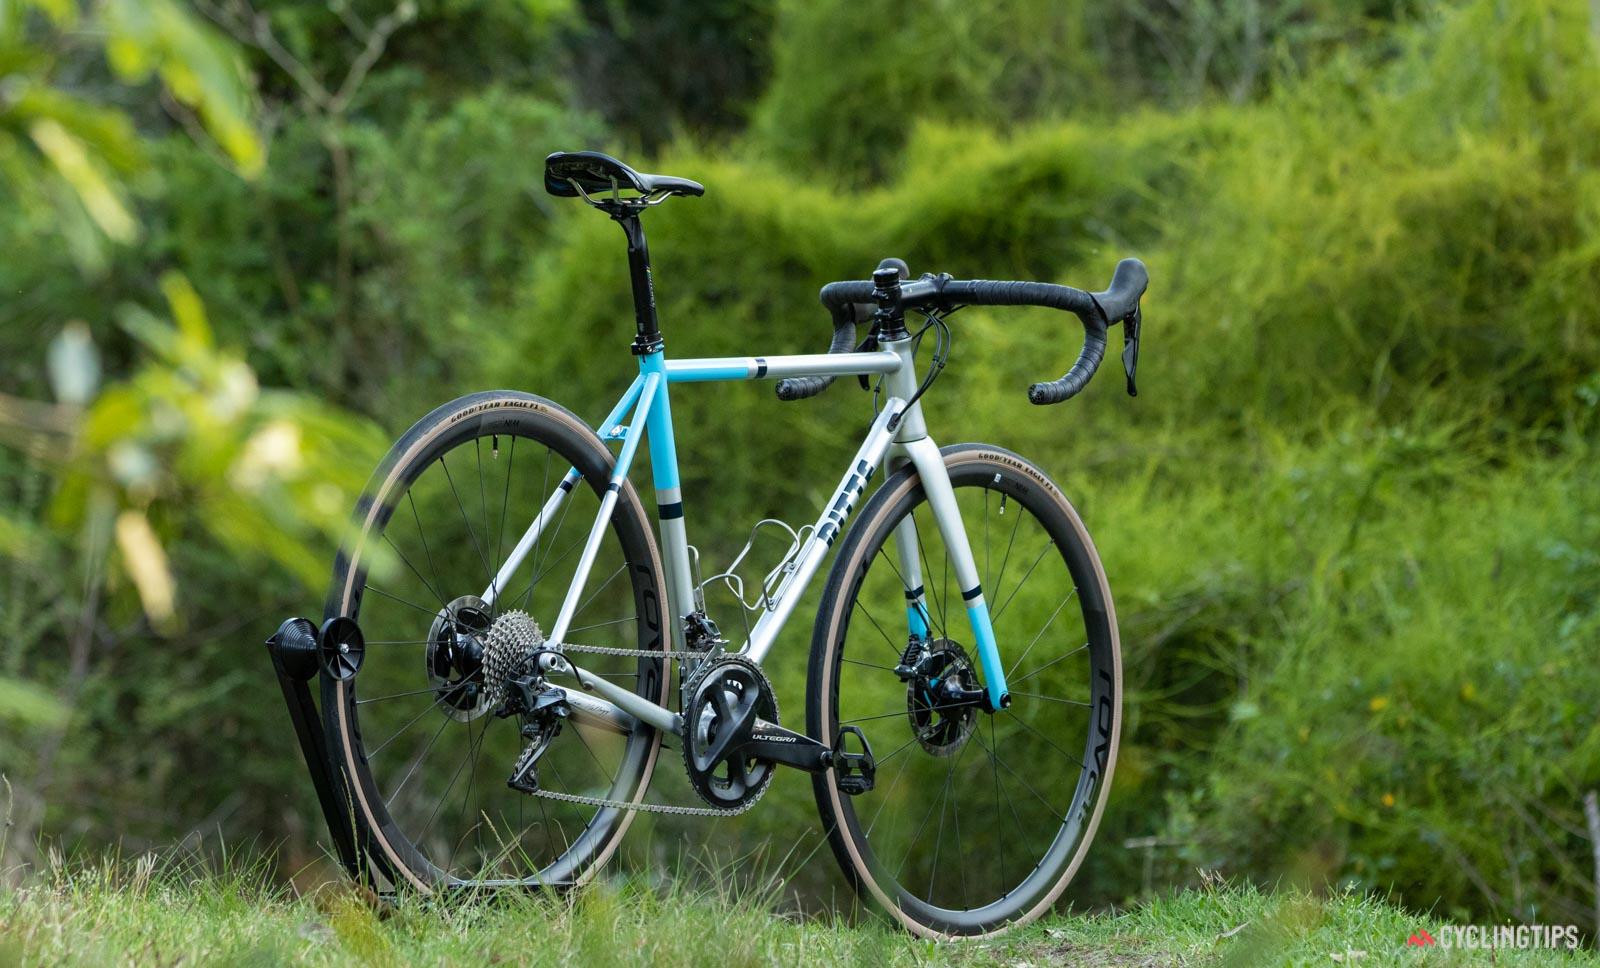 Ritte Phantom road bike review: A modern classic